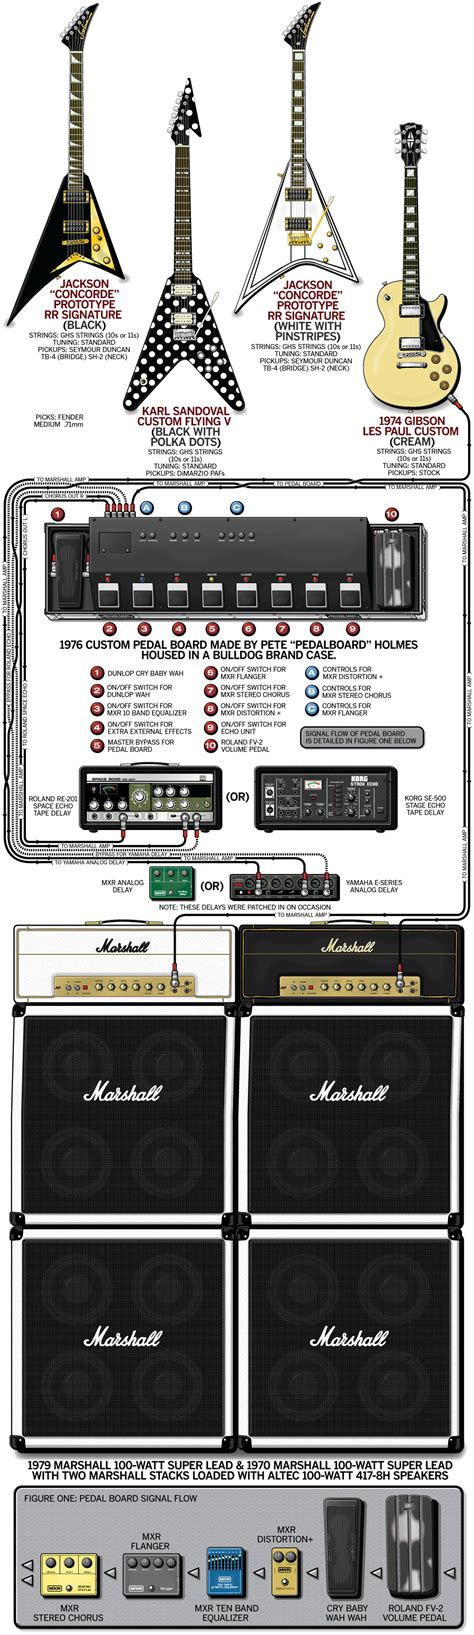 Ozzy Osbourne Criminal Record Randy Rhoads Guitar Gear Rig Ozzy Osbourne 1981 Guitareuromedia